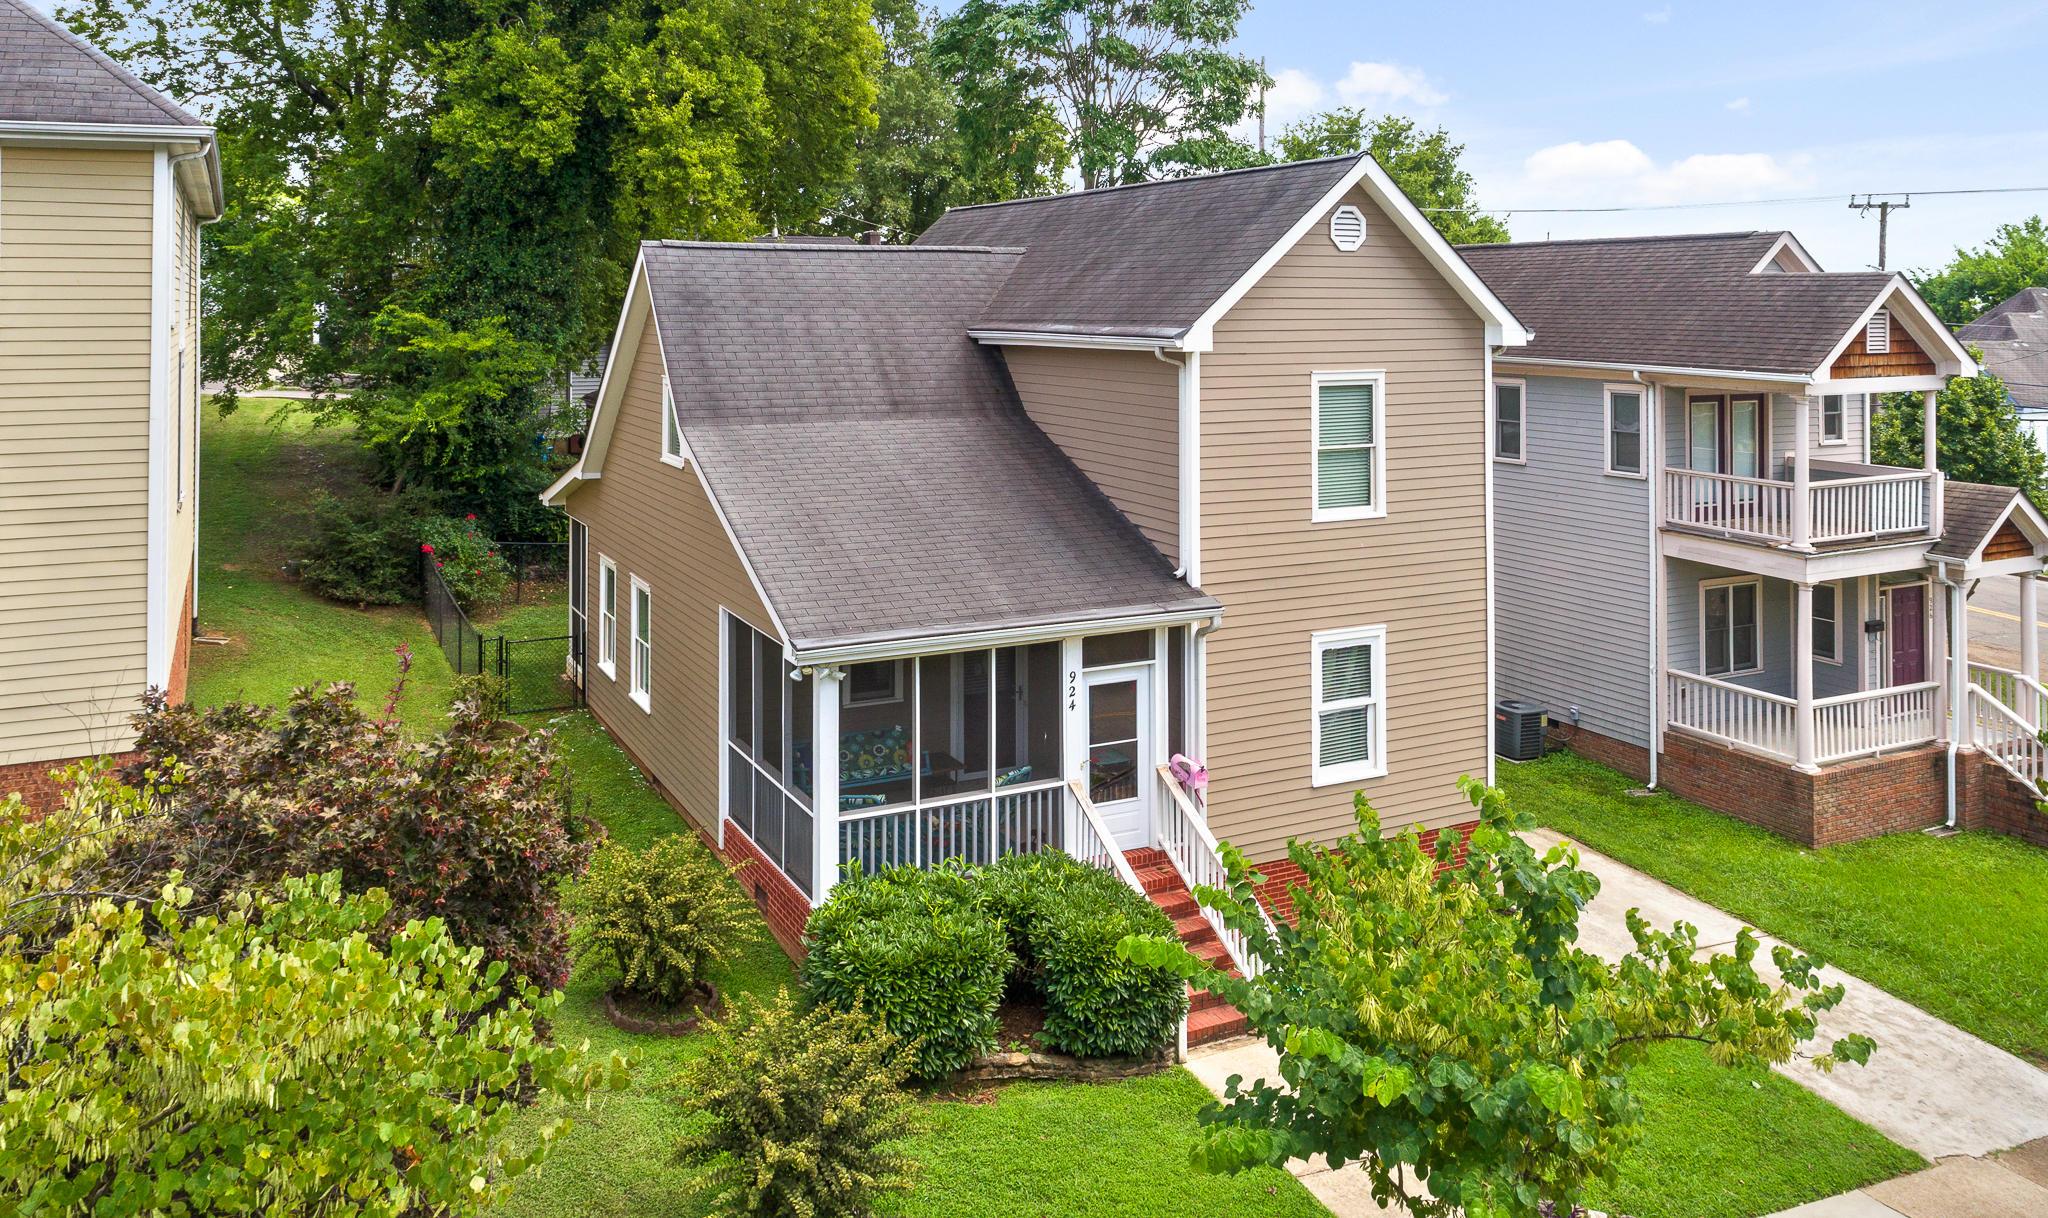 924 Magnolia St, Chattanooga, TN 37403